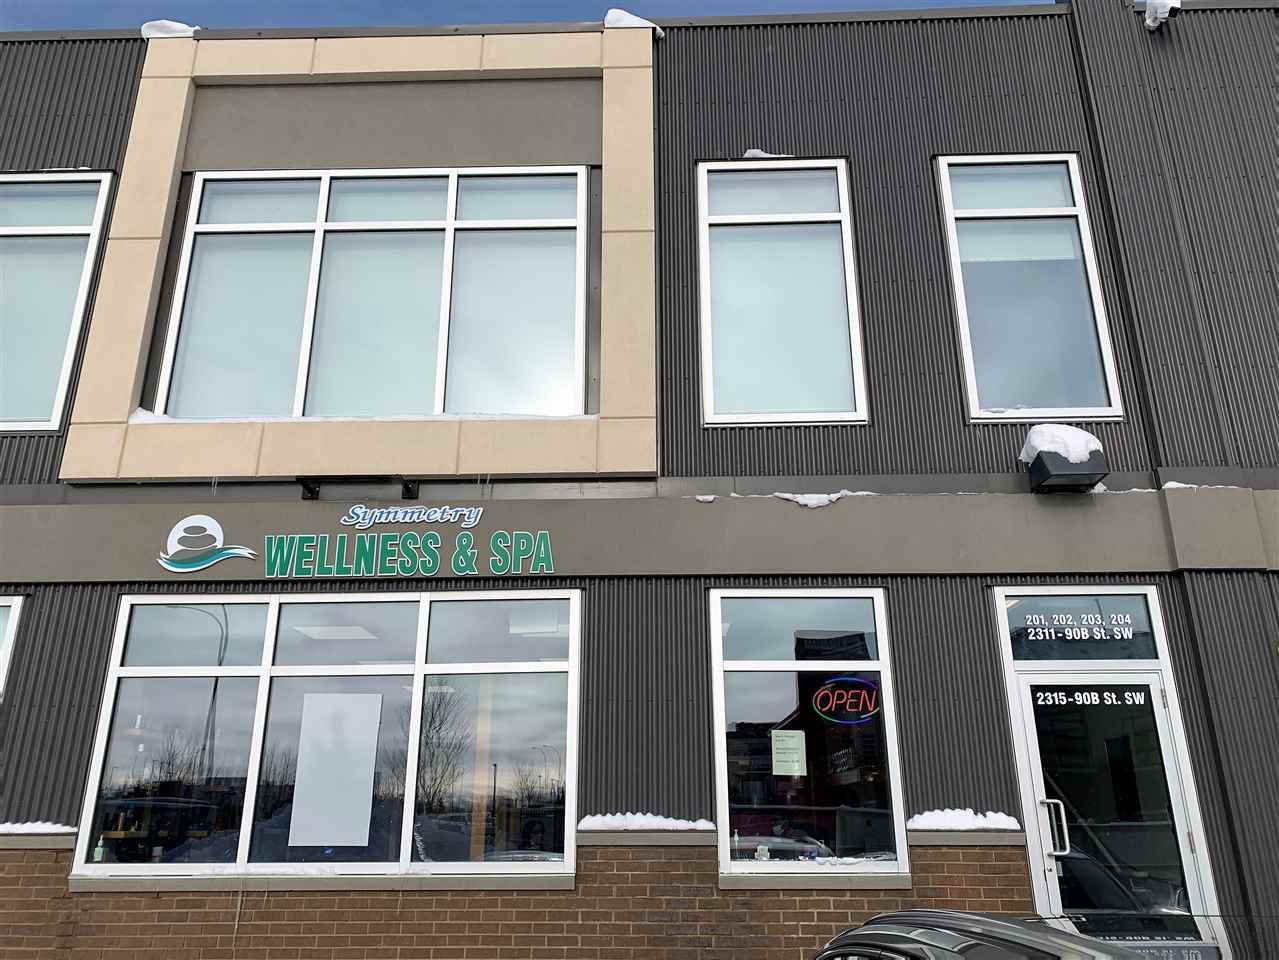 Main Photo: 2315 90B Street in Edmonton: Zone 53 Retail for sale : MLS®# E4220605